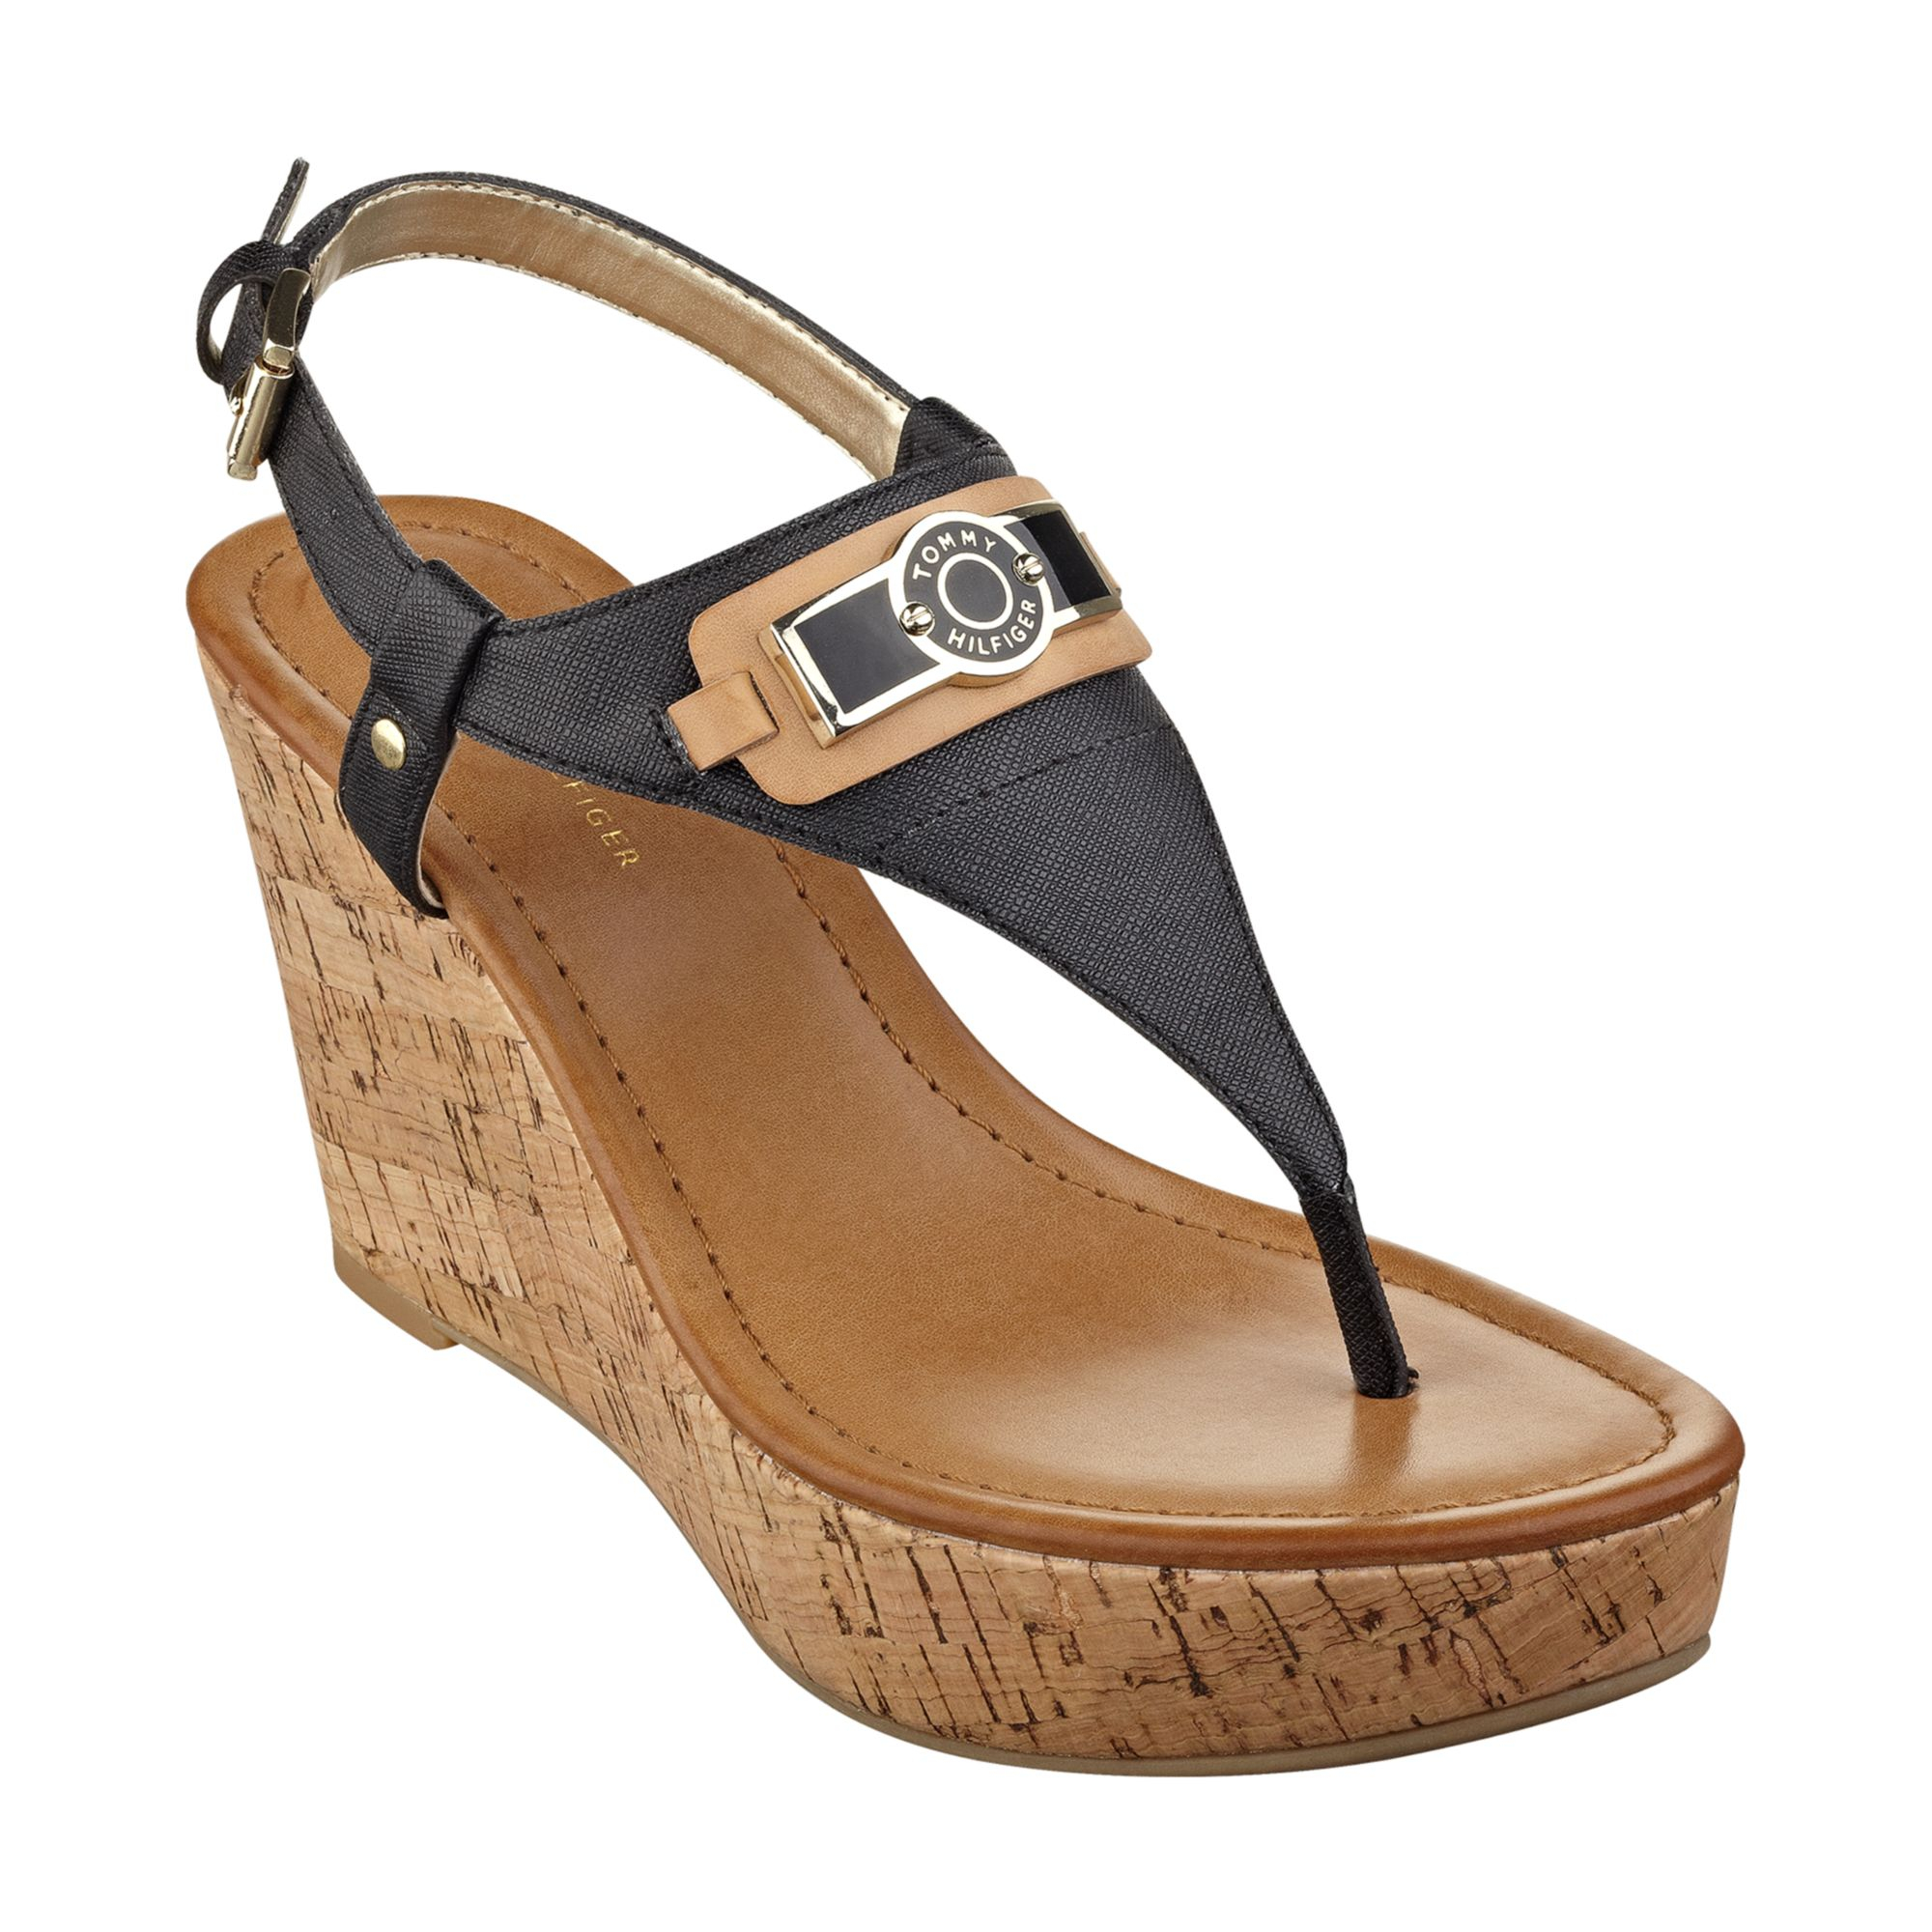 tommy hilfiger womens monor platform wedge thong sandals in black lyst. Black Bedroom Furniture Sets. Home Design Ideas